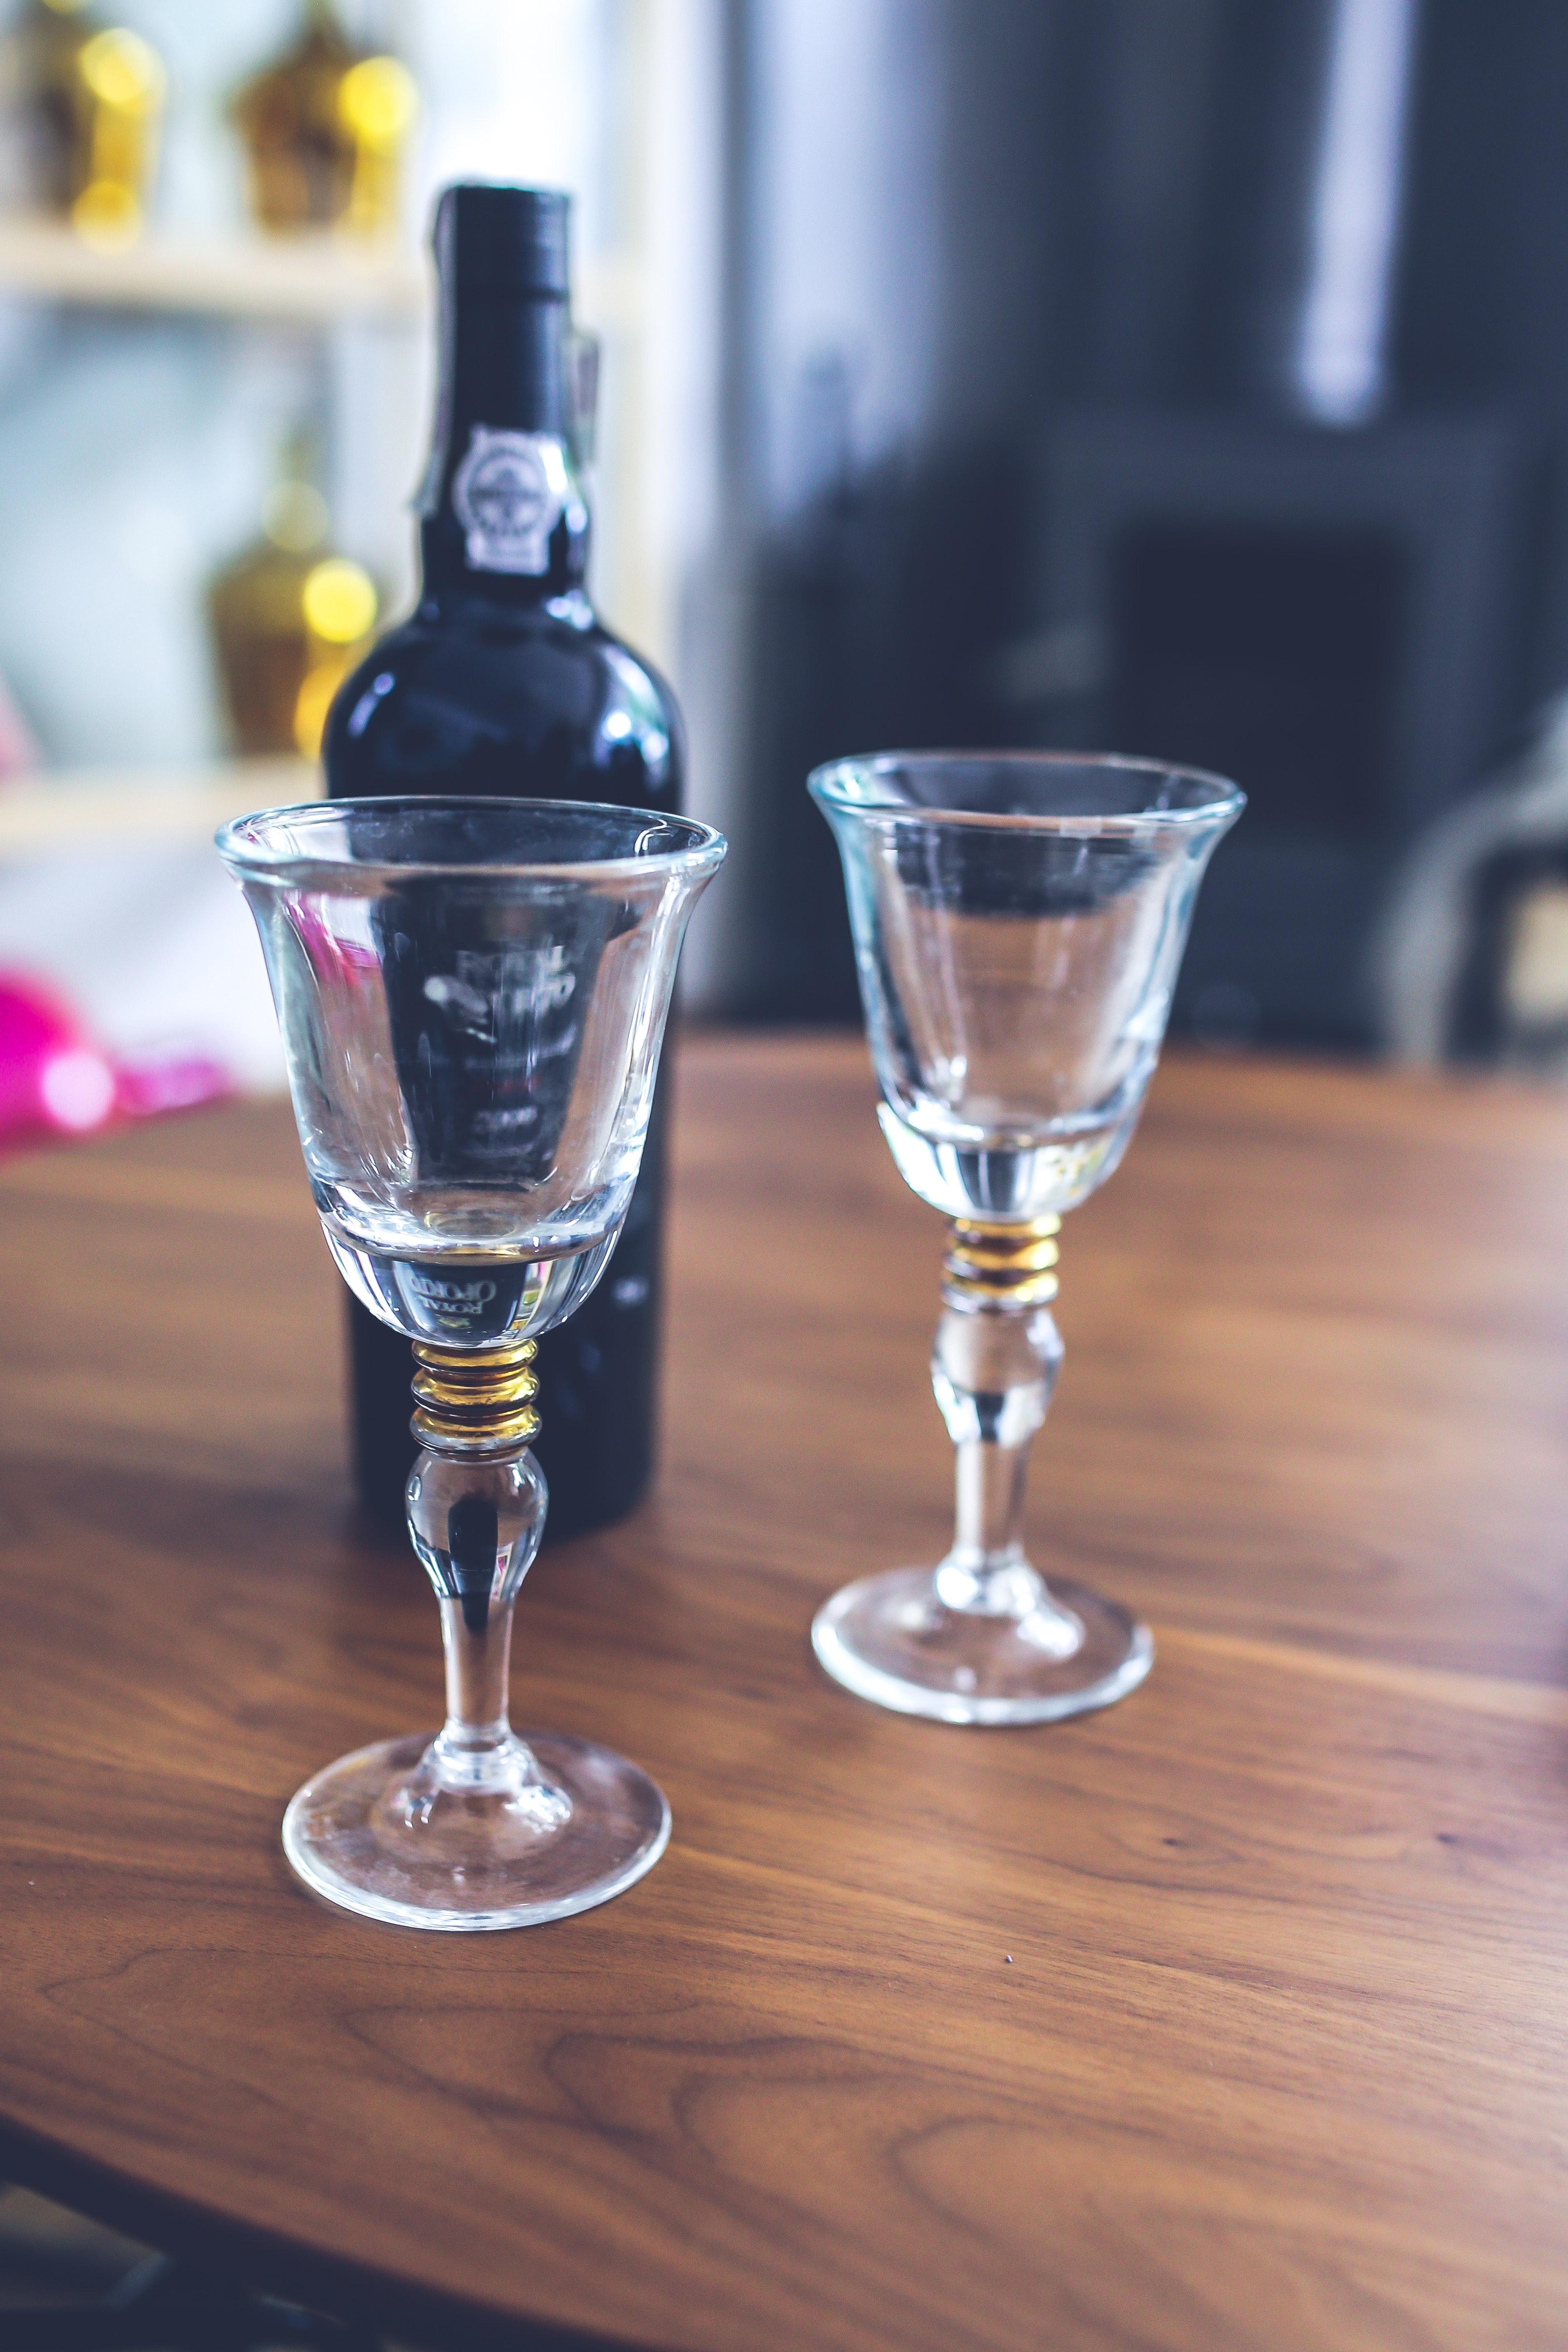 Two wine glasses & bottle, Alcohol, Night, Wine, Toast, HQ Photo